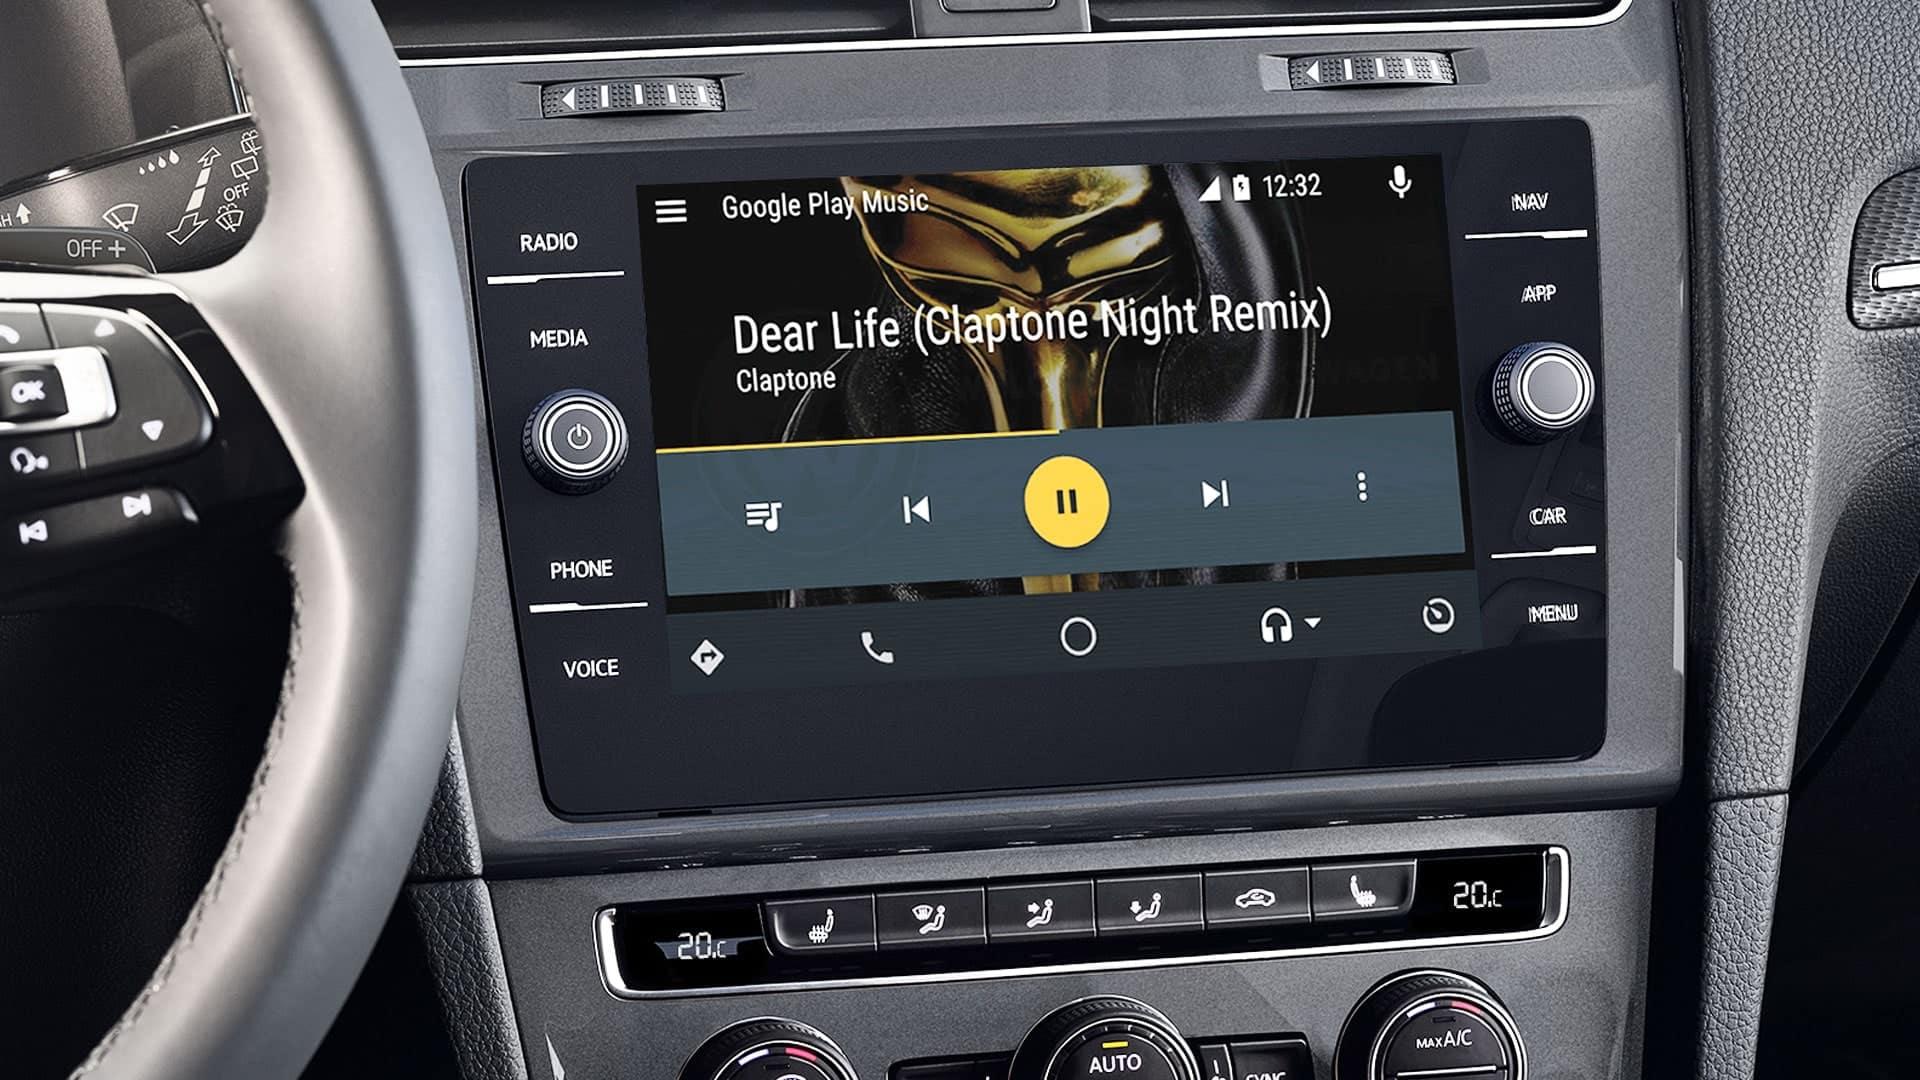 VW SportWagen Infotainment